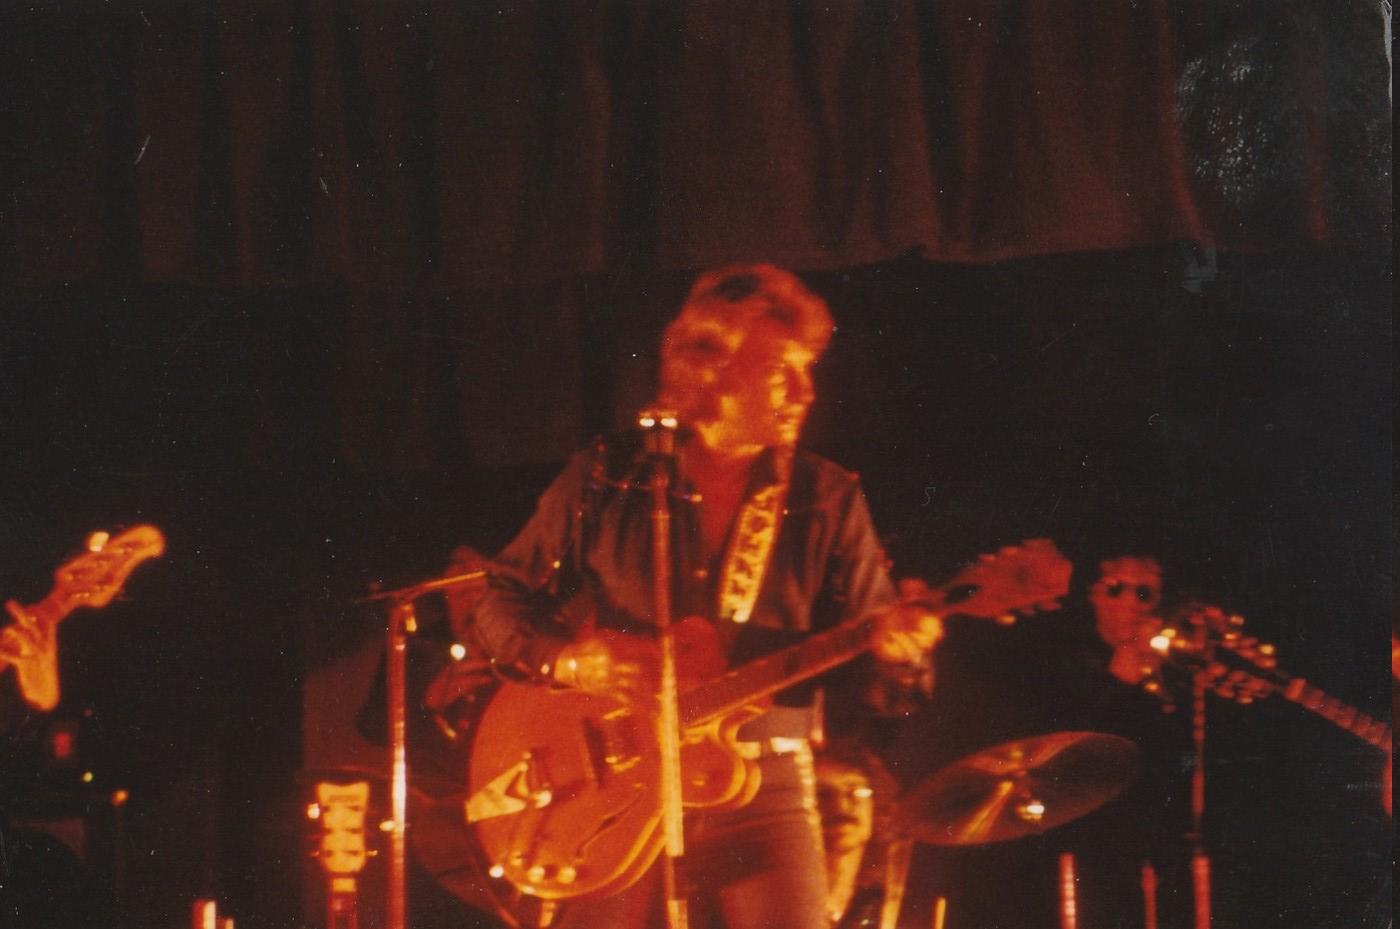 INÉDIT  :  JOHNNY HALLYDAY EN TOURNEE - HIVER 1978 -1979 ( PHOTOS INÉDITES )   Img_2635